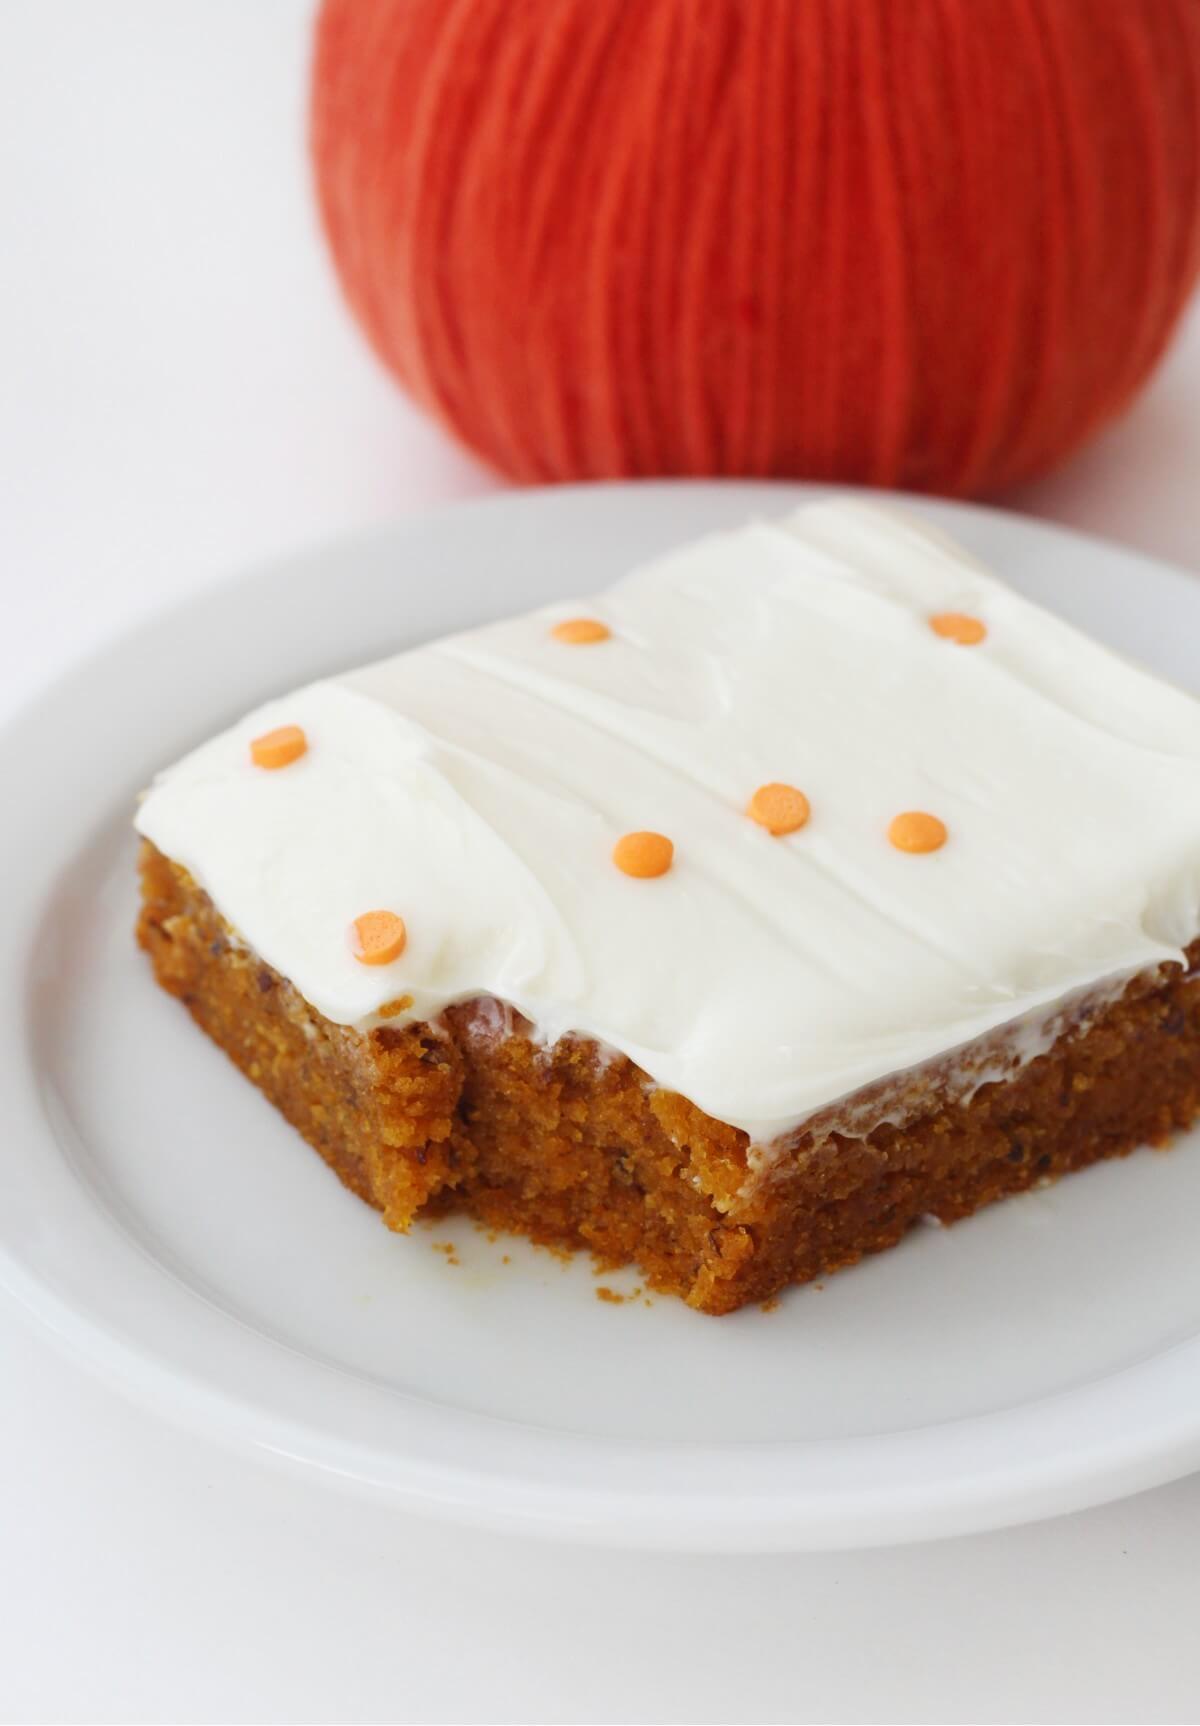 slice of pumpkin cake with pumpkin decoration